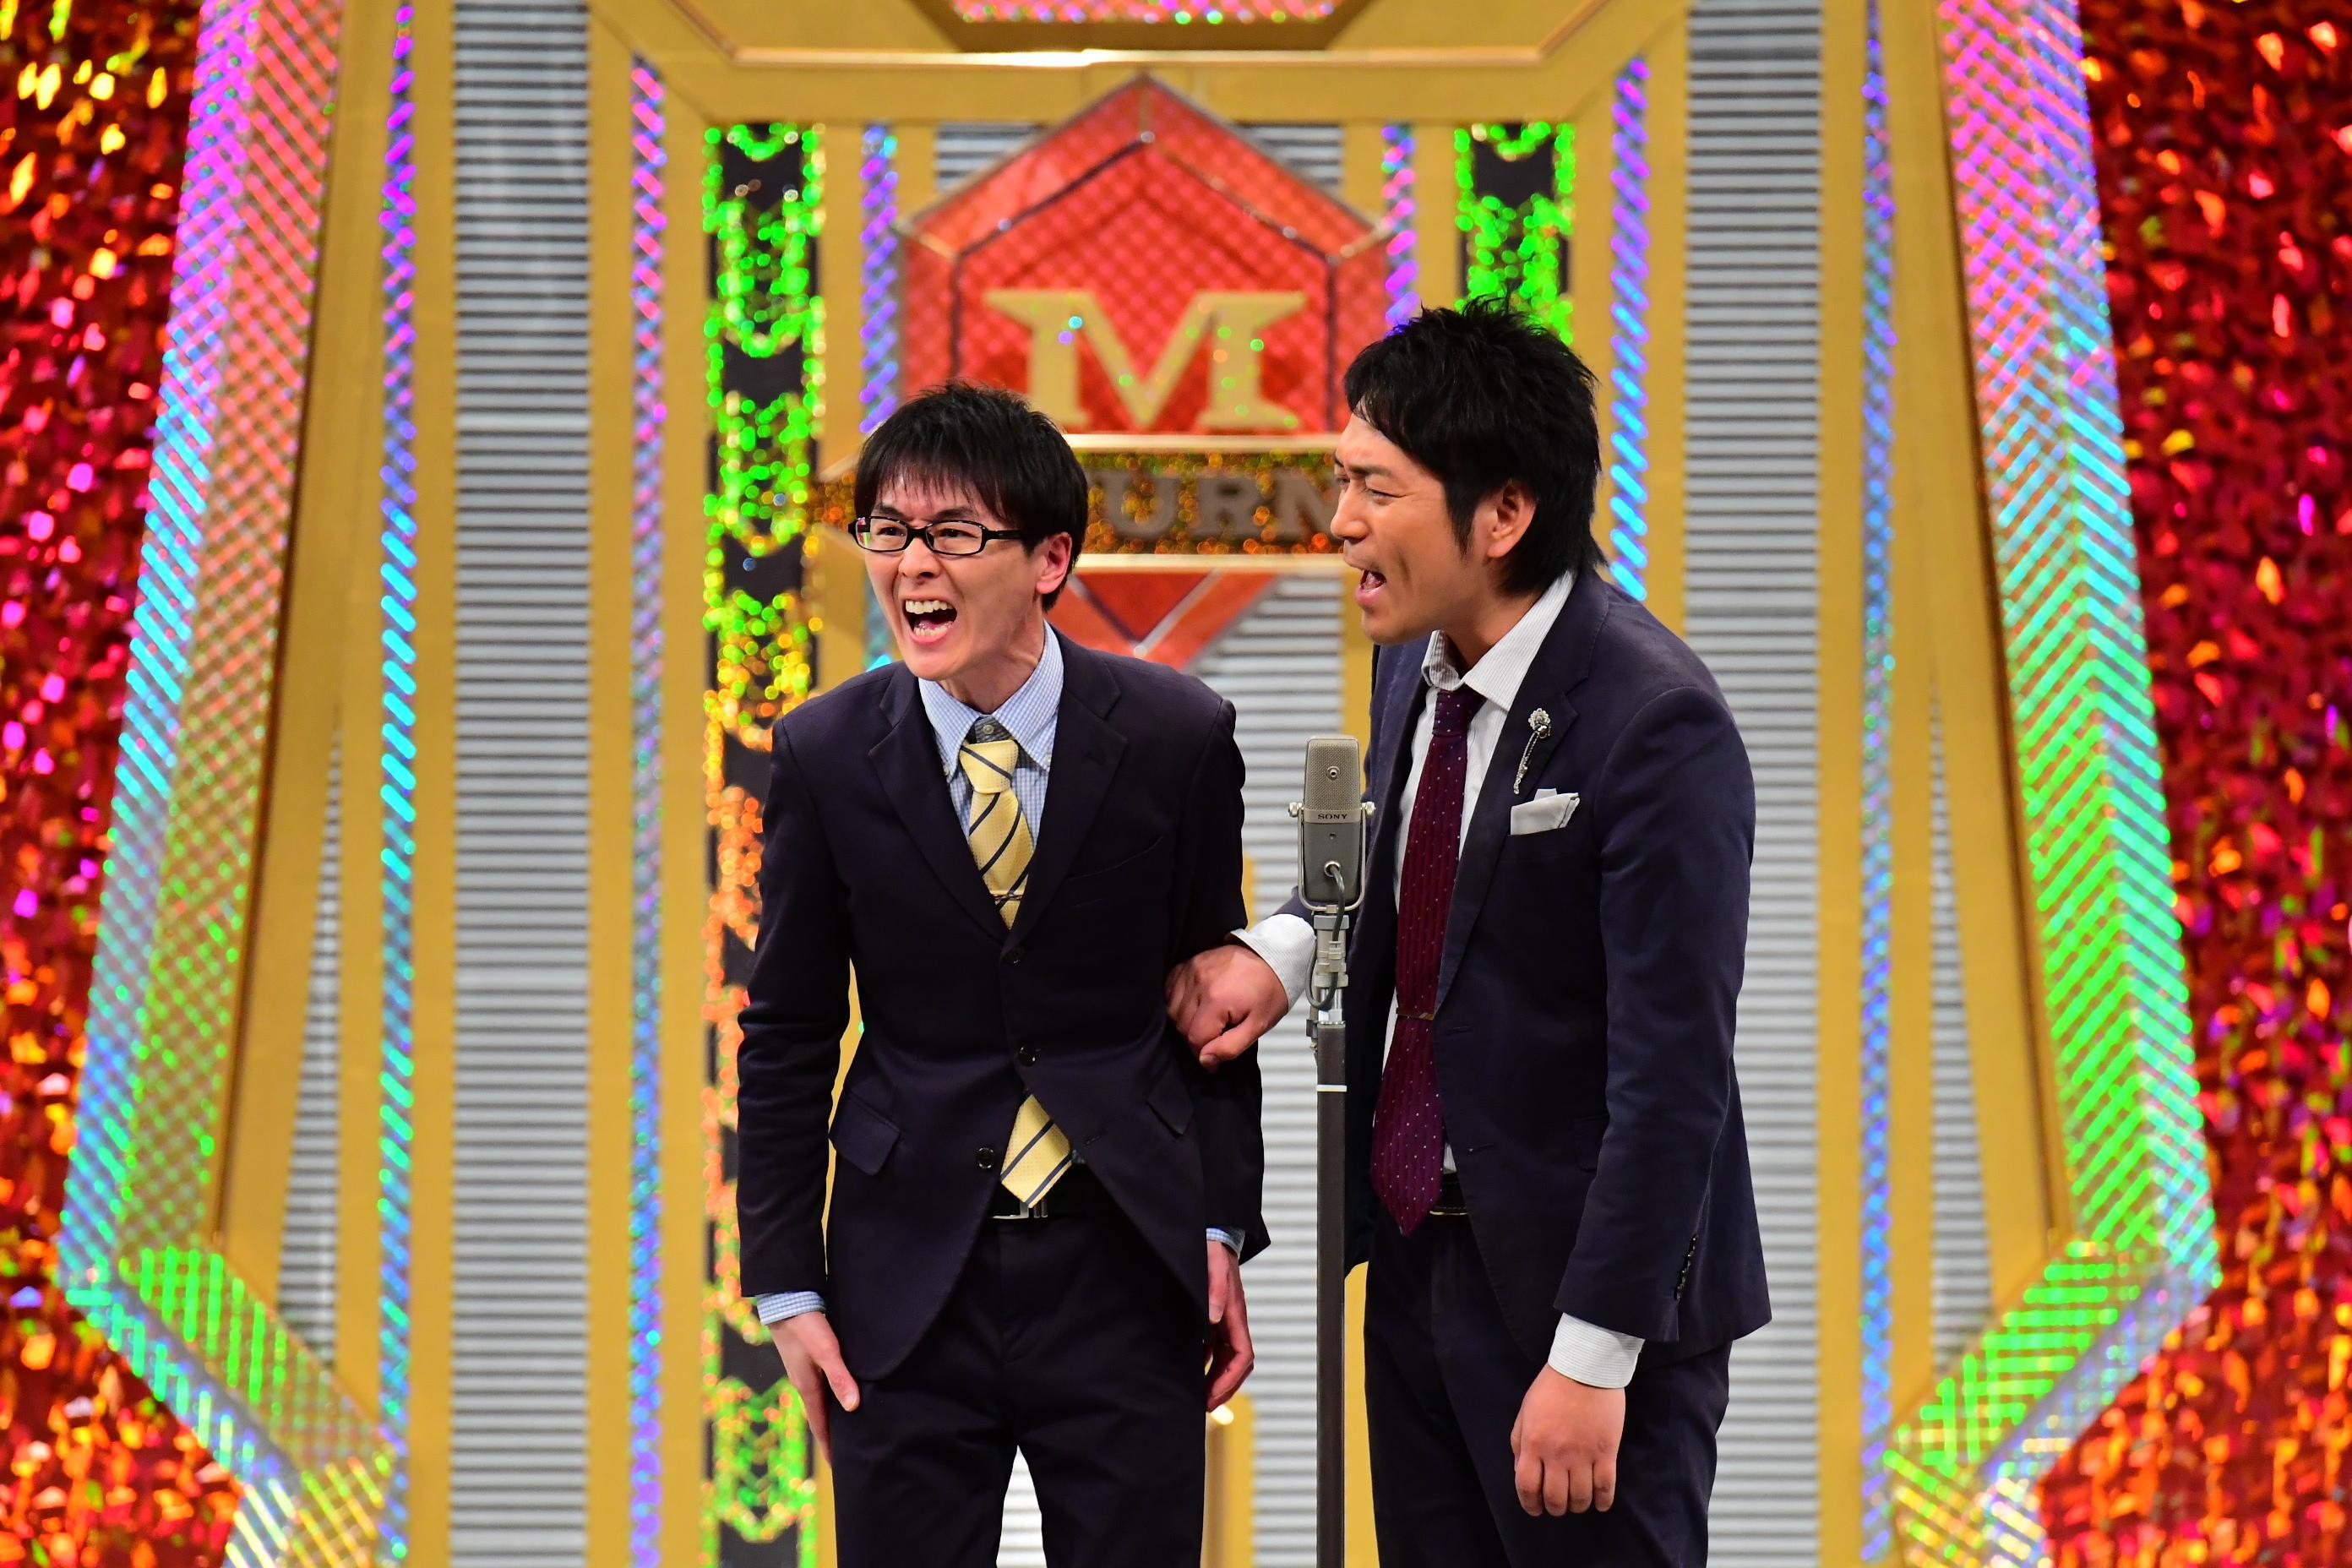 http://news.yoshimoto.co.jp/20170228155644-c769b0517a78f592792edfaf2063e48901f26713.jpg